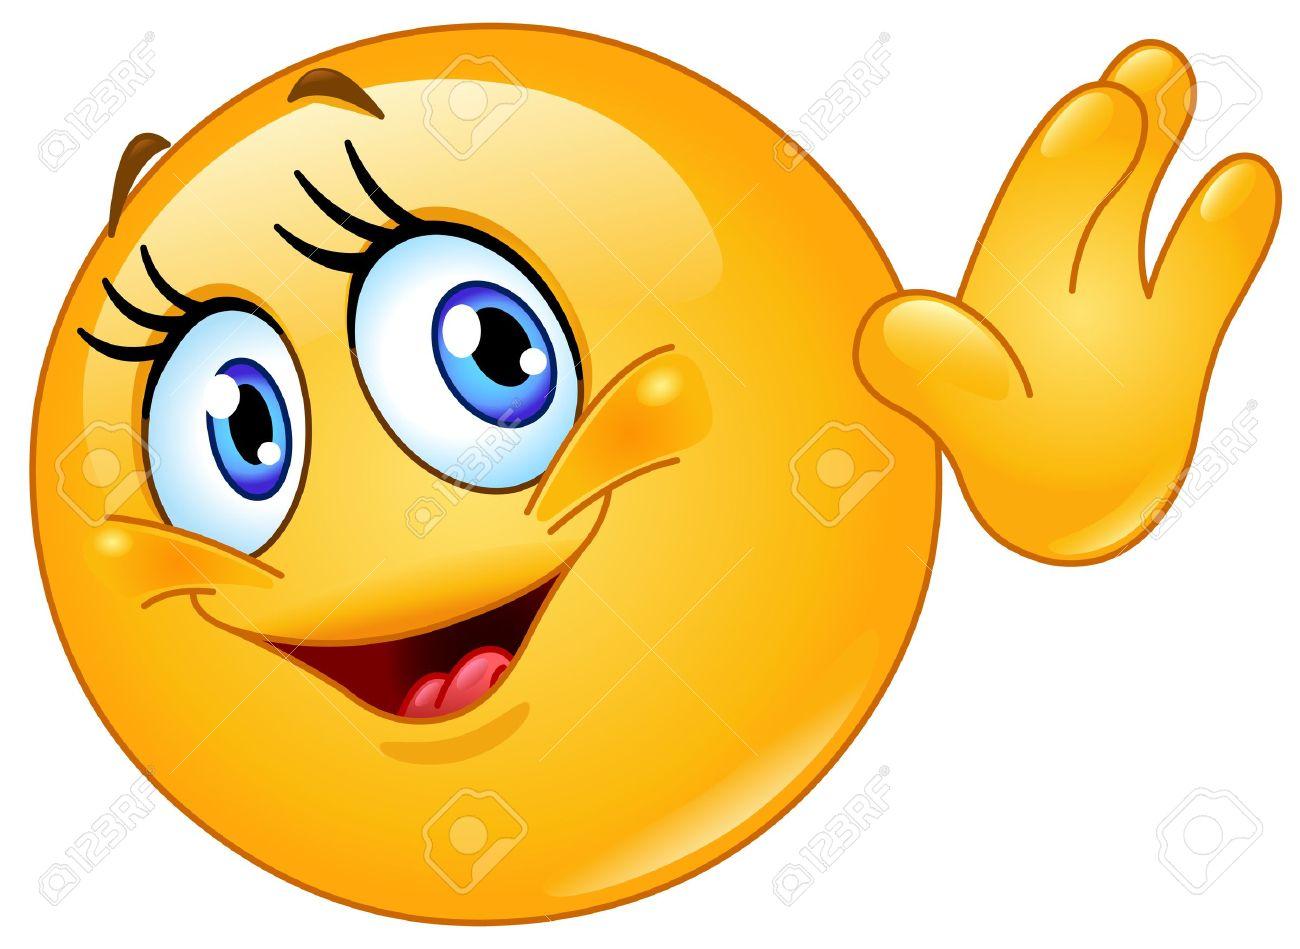 Female emoticon waving hello - 21178840